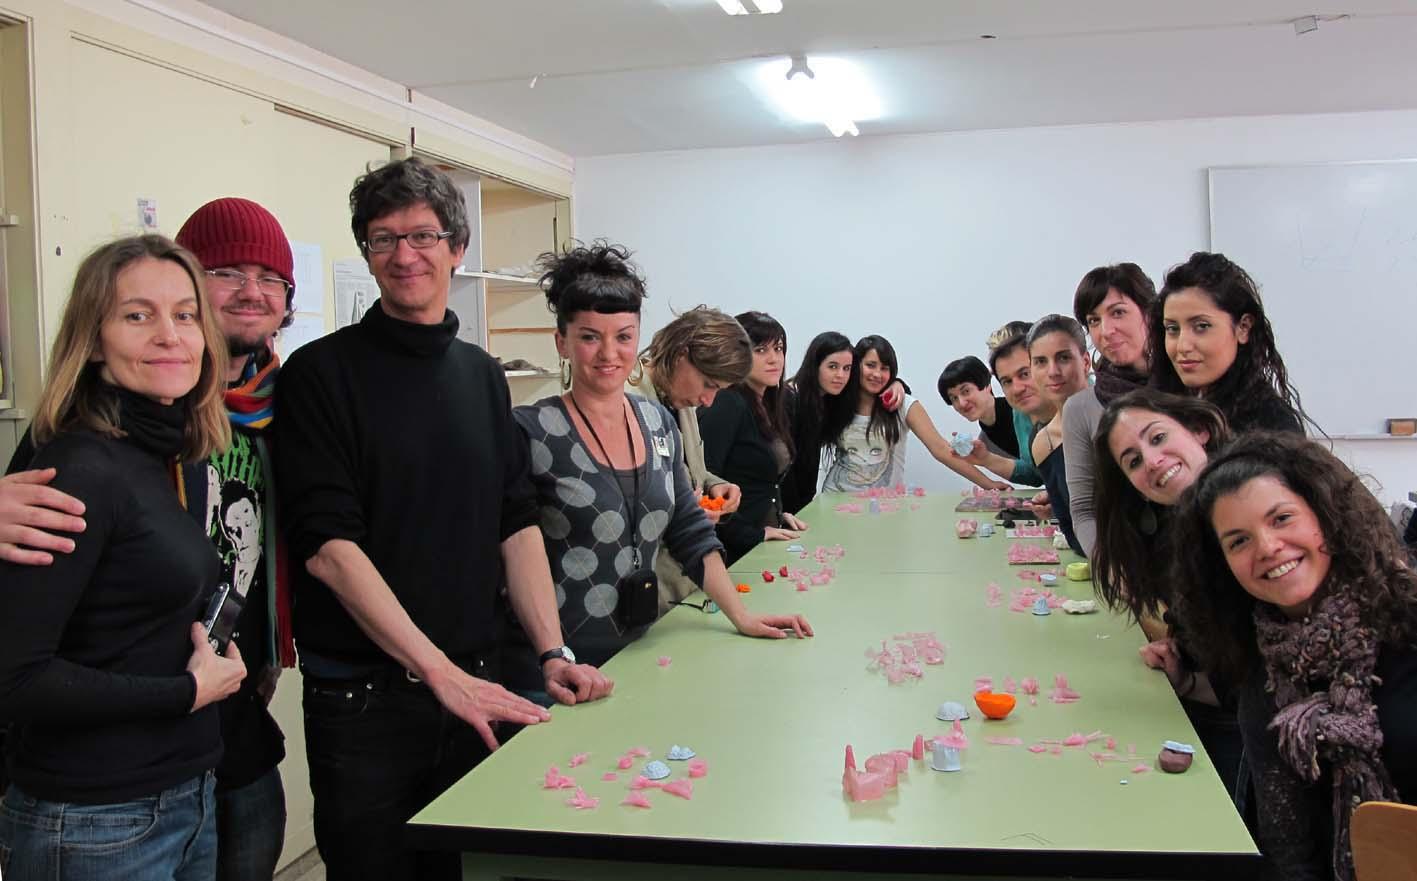 Joves joiers welkome to wax word workshop por peter bauhuis - Easd valencia ...